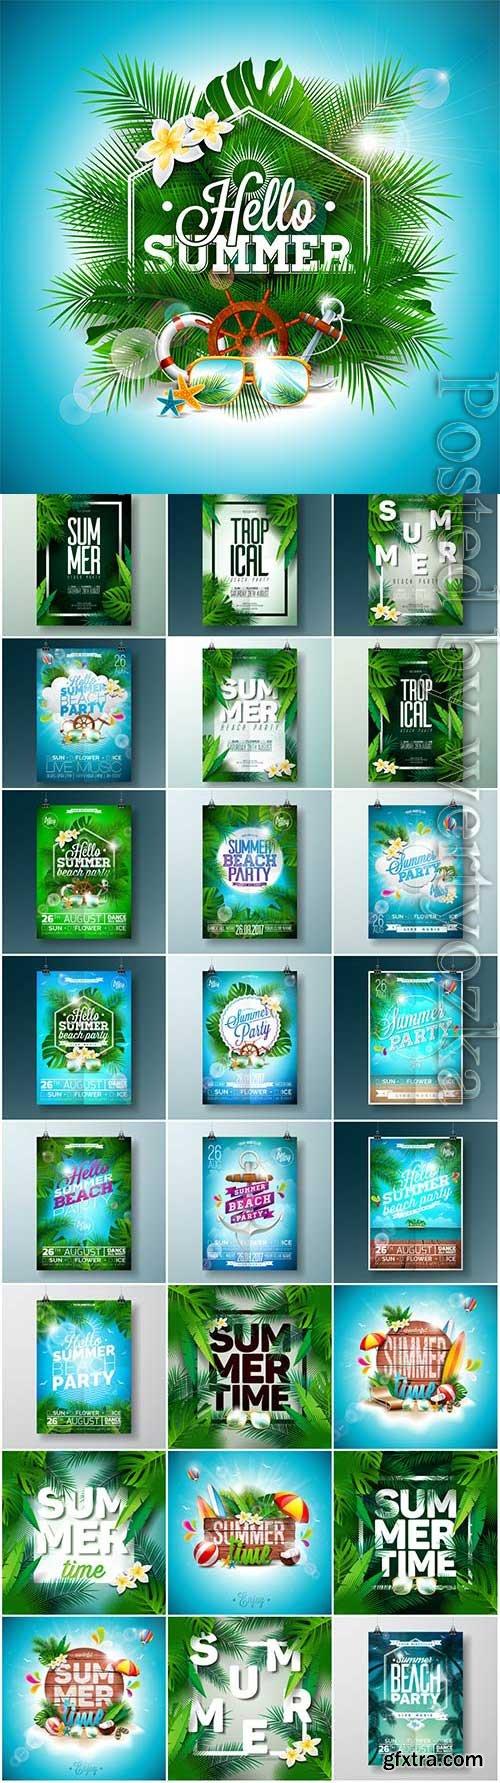 Summer posters in vector